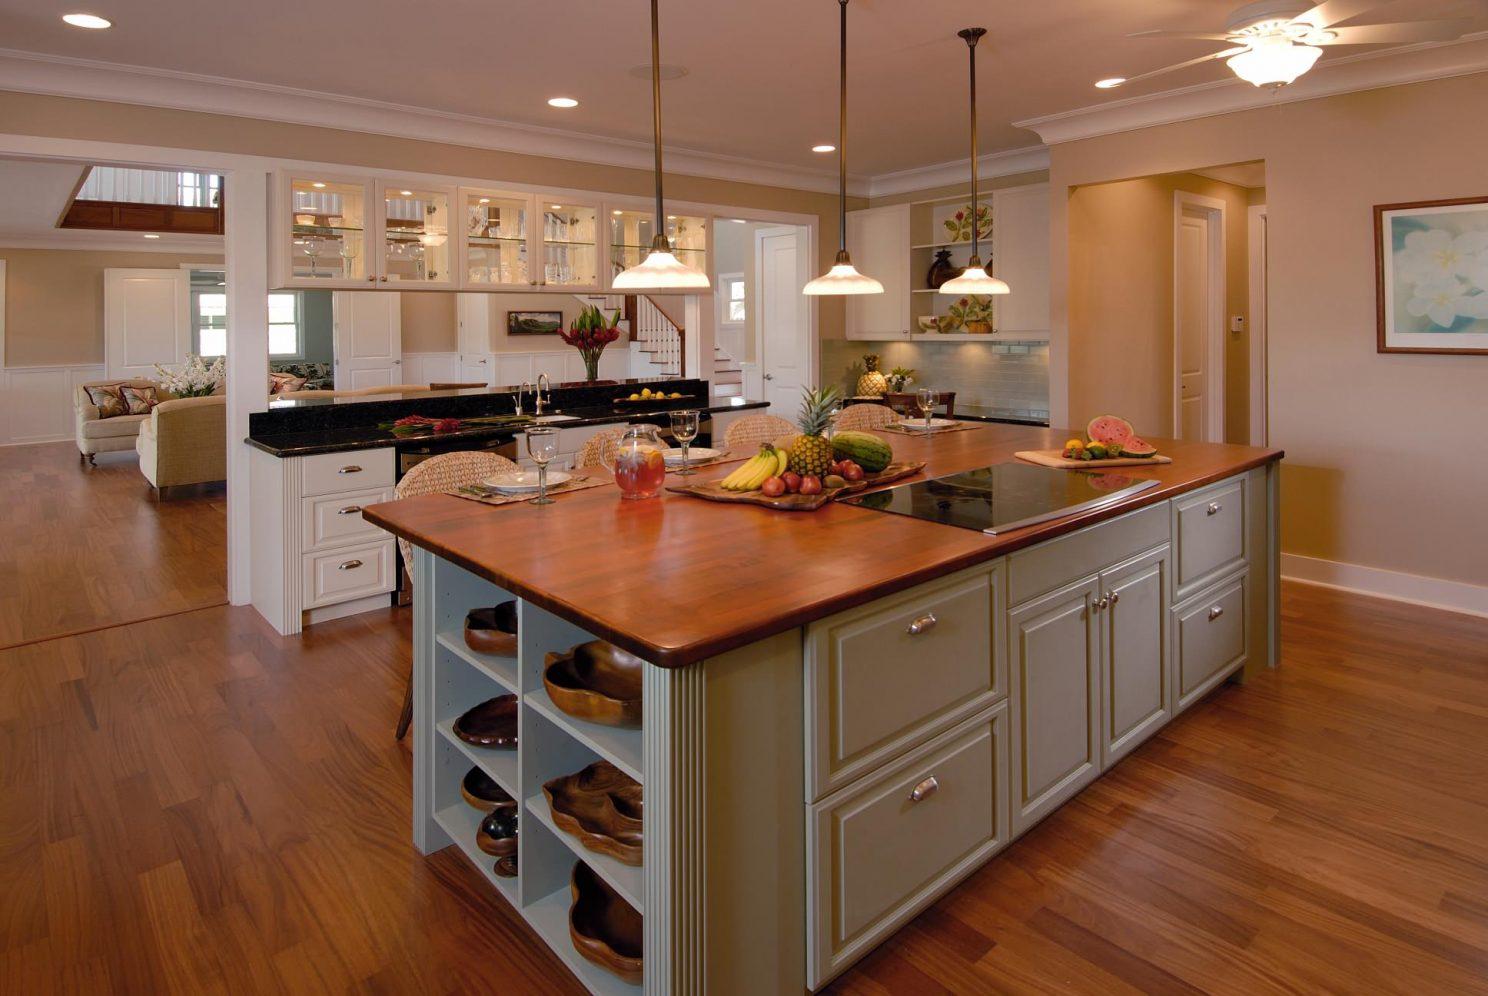 Fullsize Of Home Kitchen Island